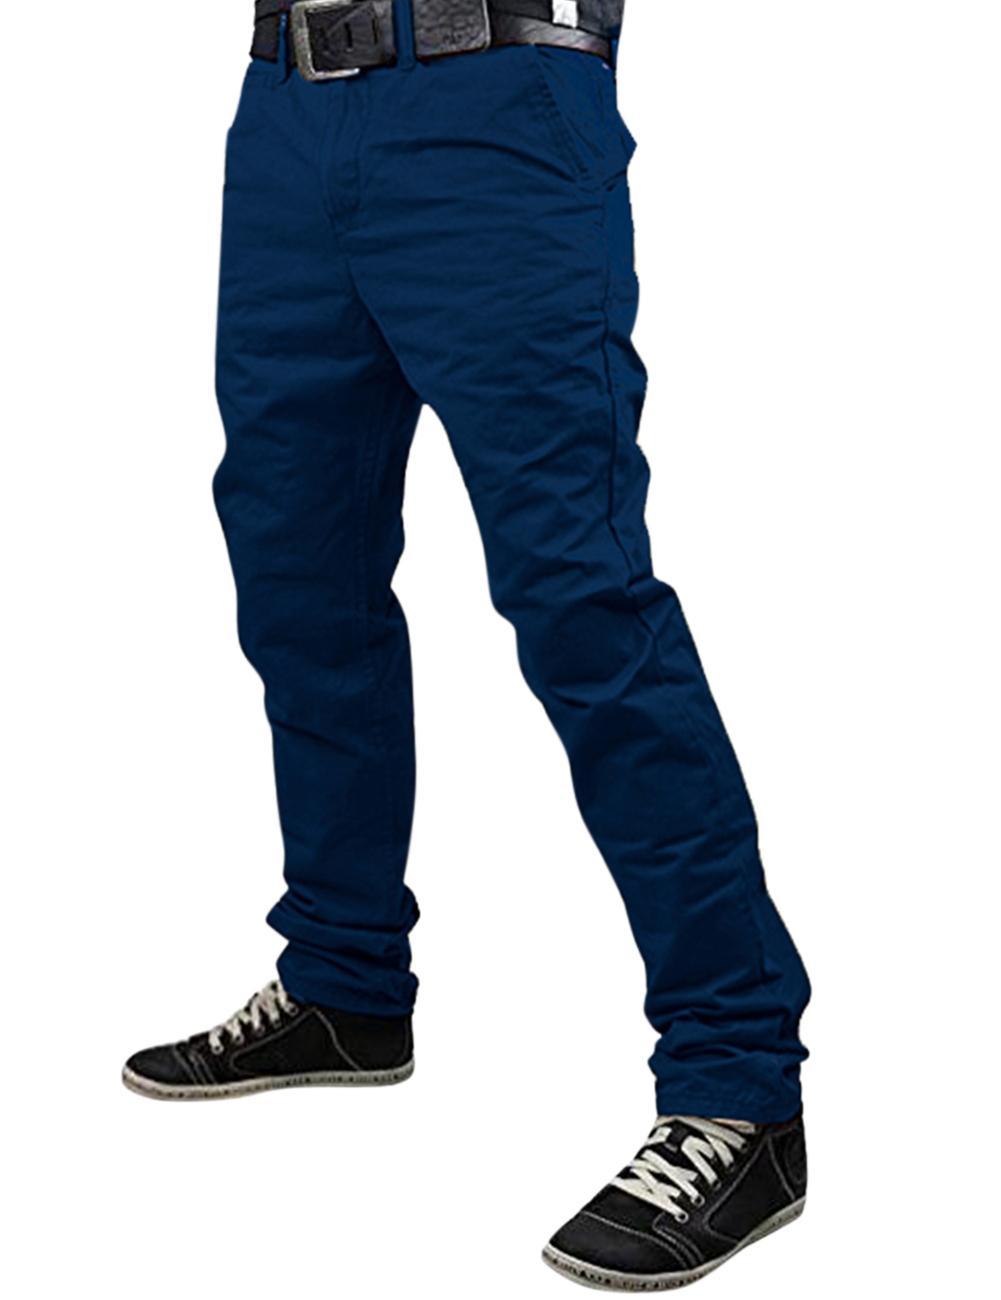 Fashionable Men Solid Color Trousers Business Straight-leg Pants Casual Cotton Pants Navy Blue_M